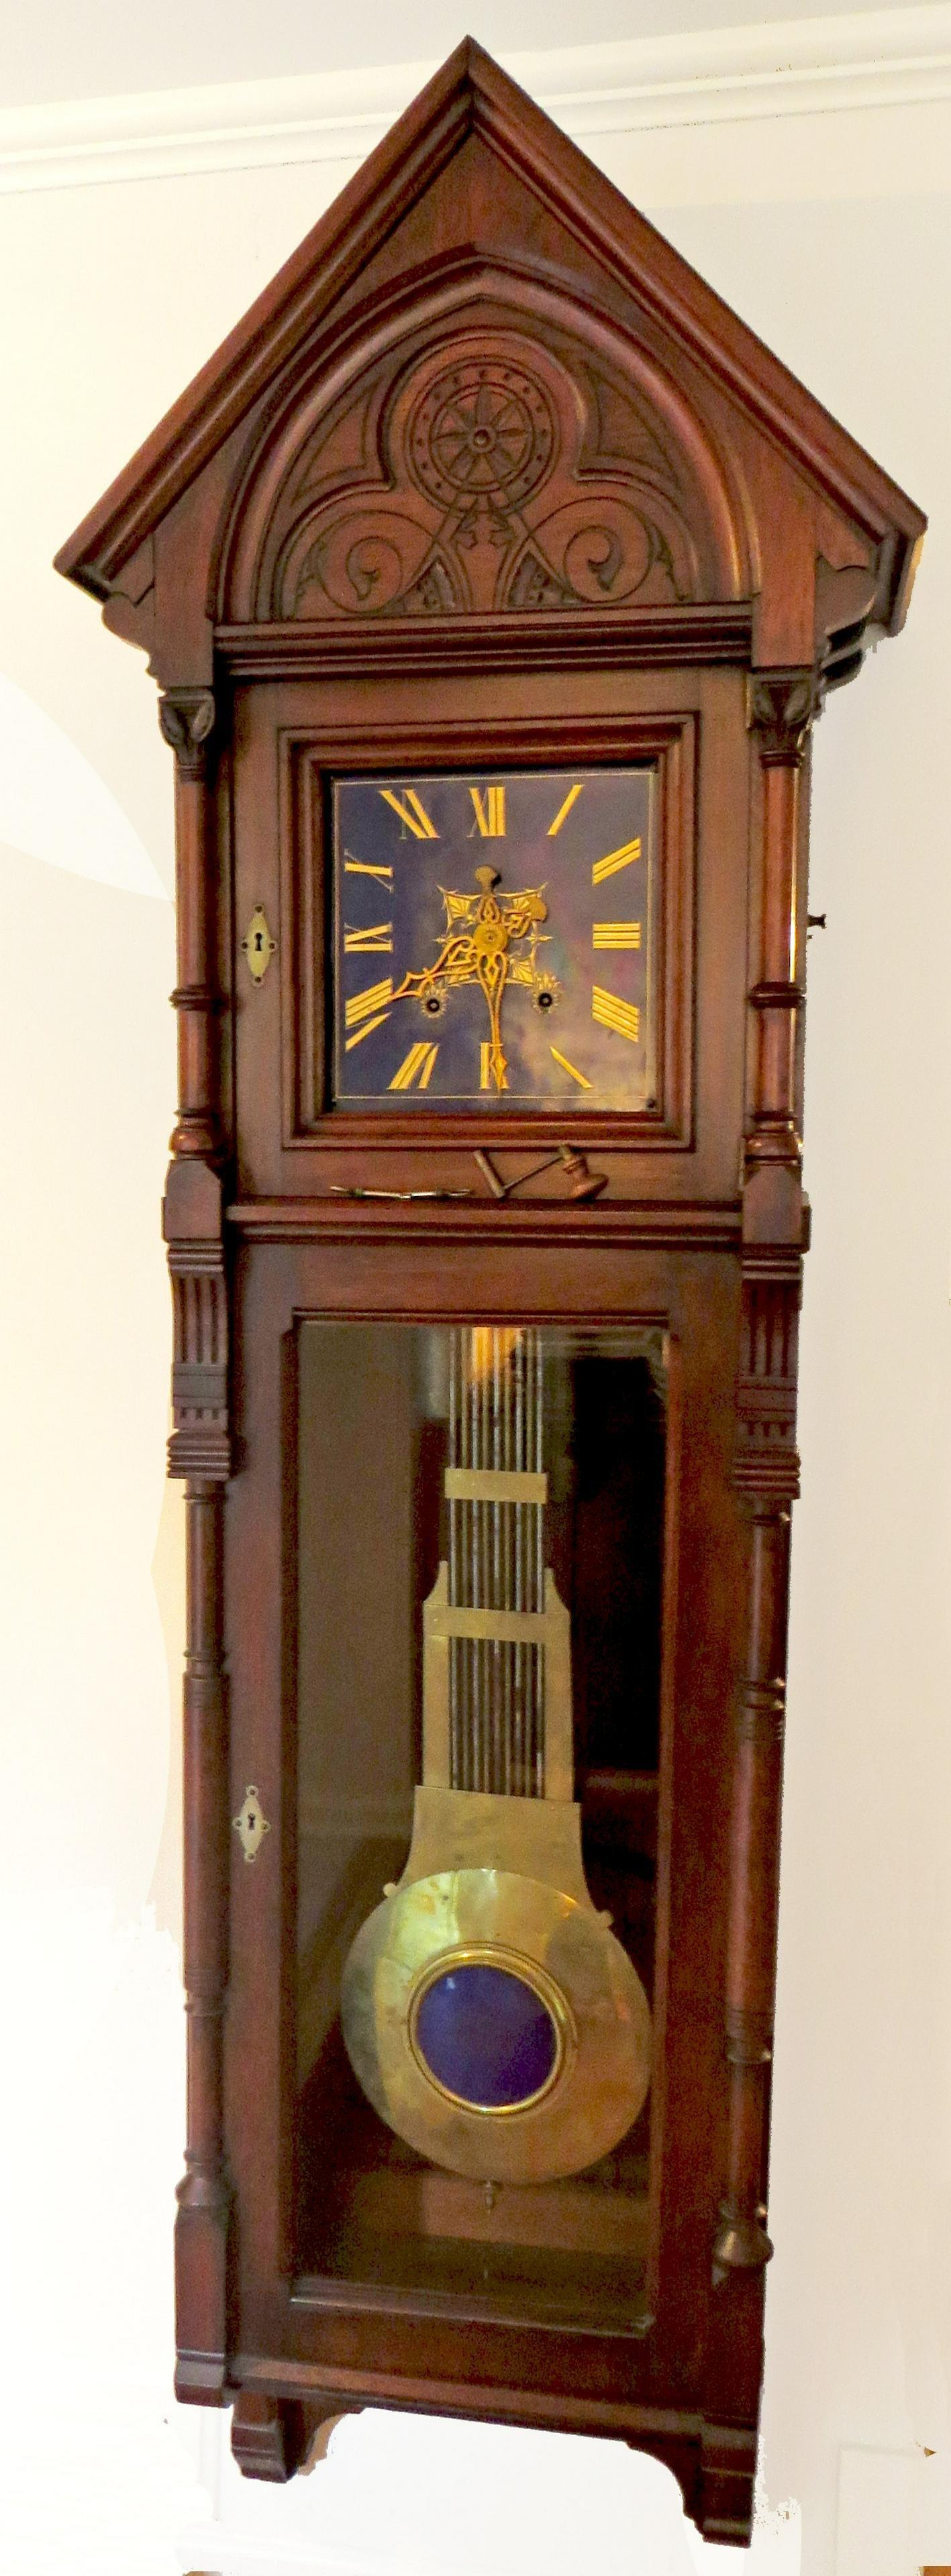 LARGE VICTORIAN REGULATOR CLOCK